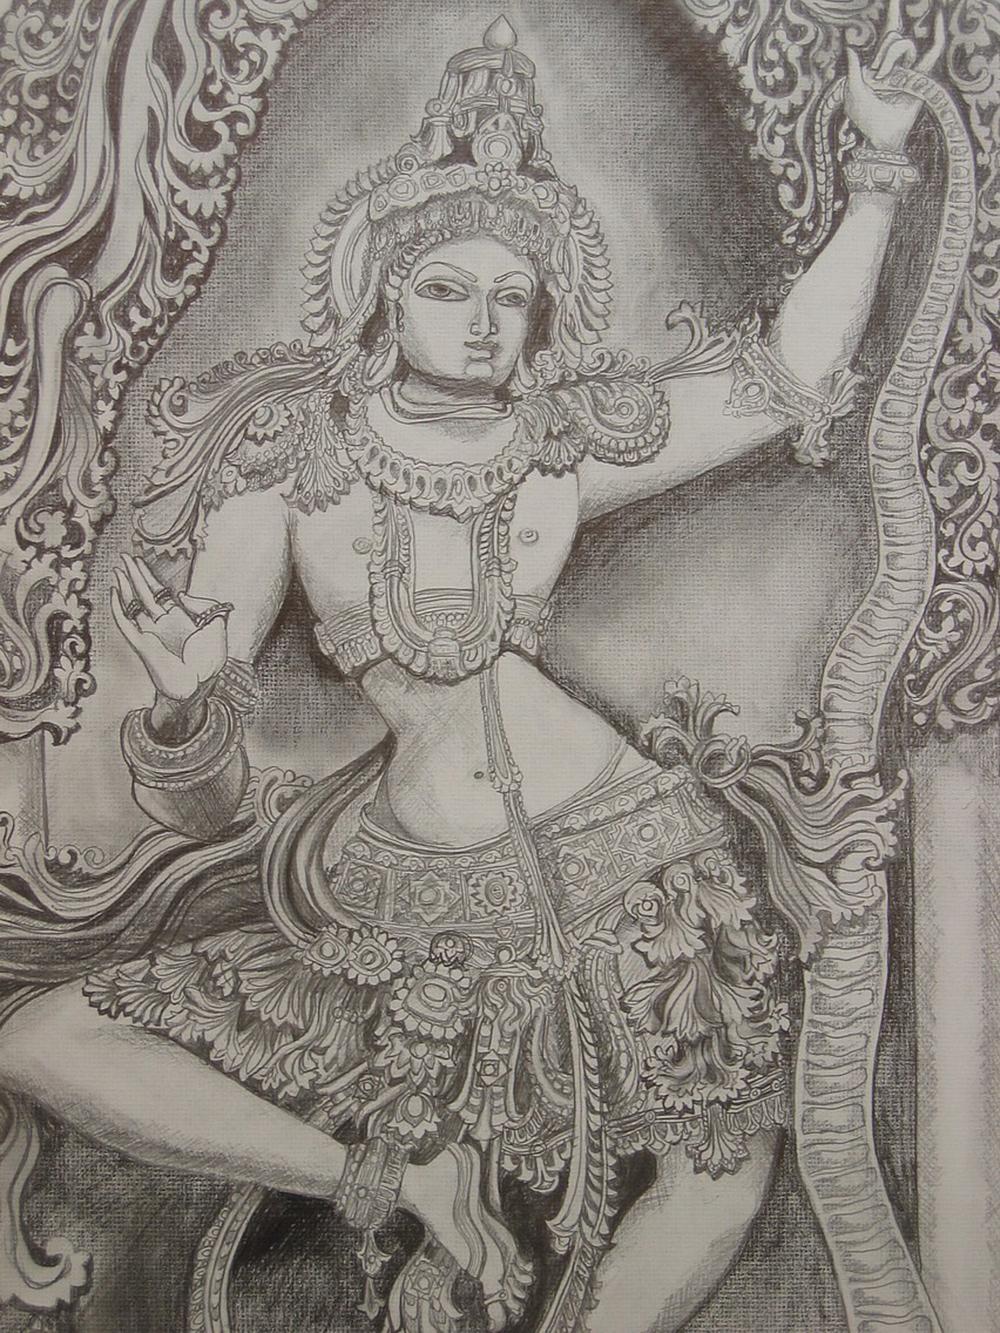 Kaliya Mardana - Detail